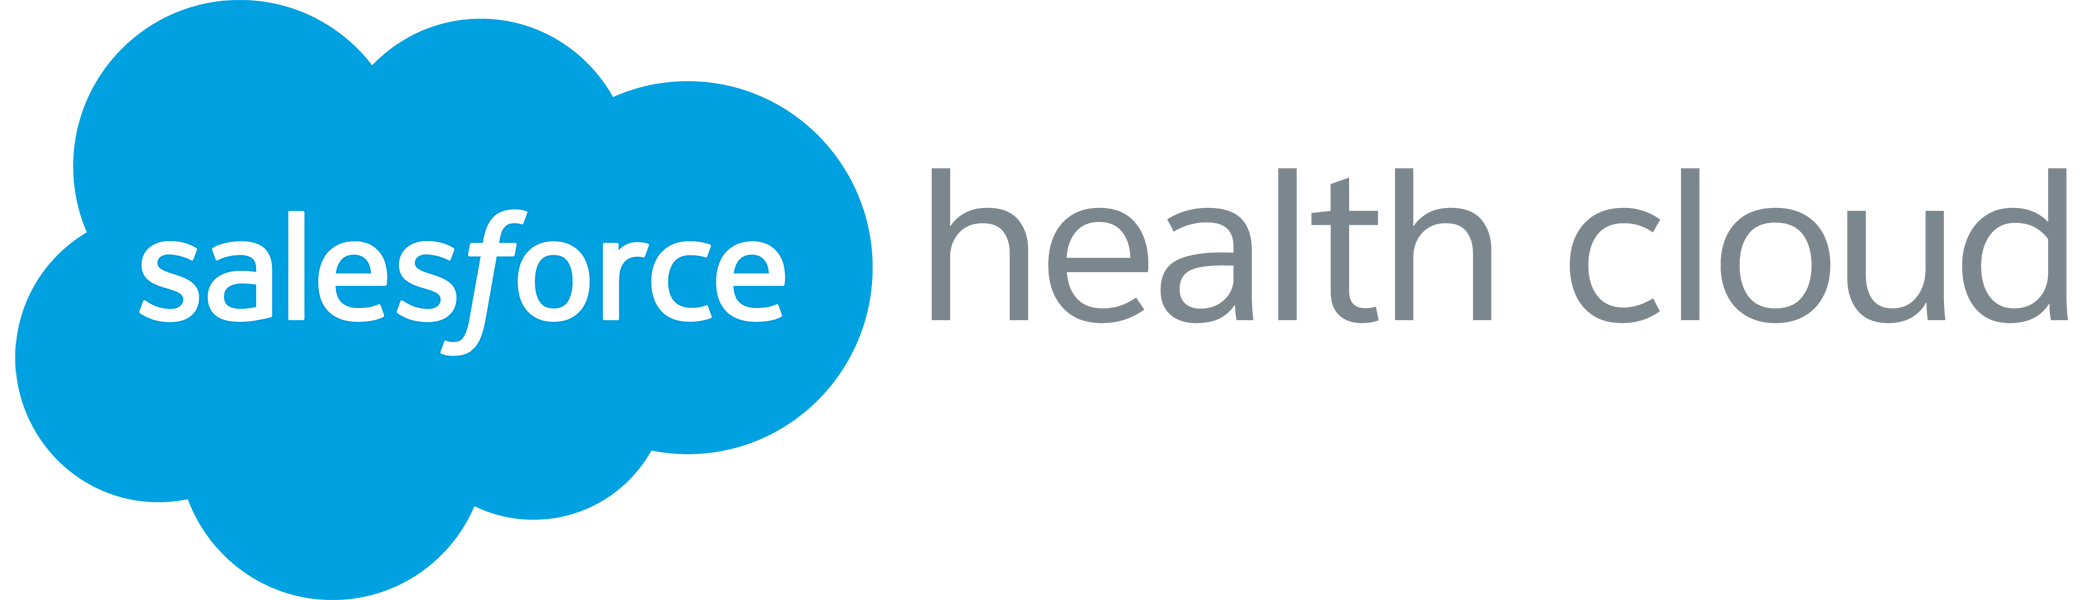 Salesforce-Health-Cloud.png